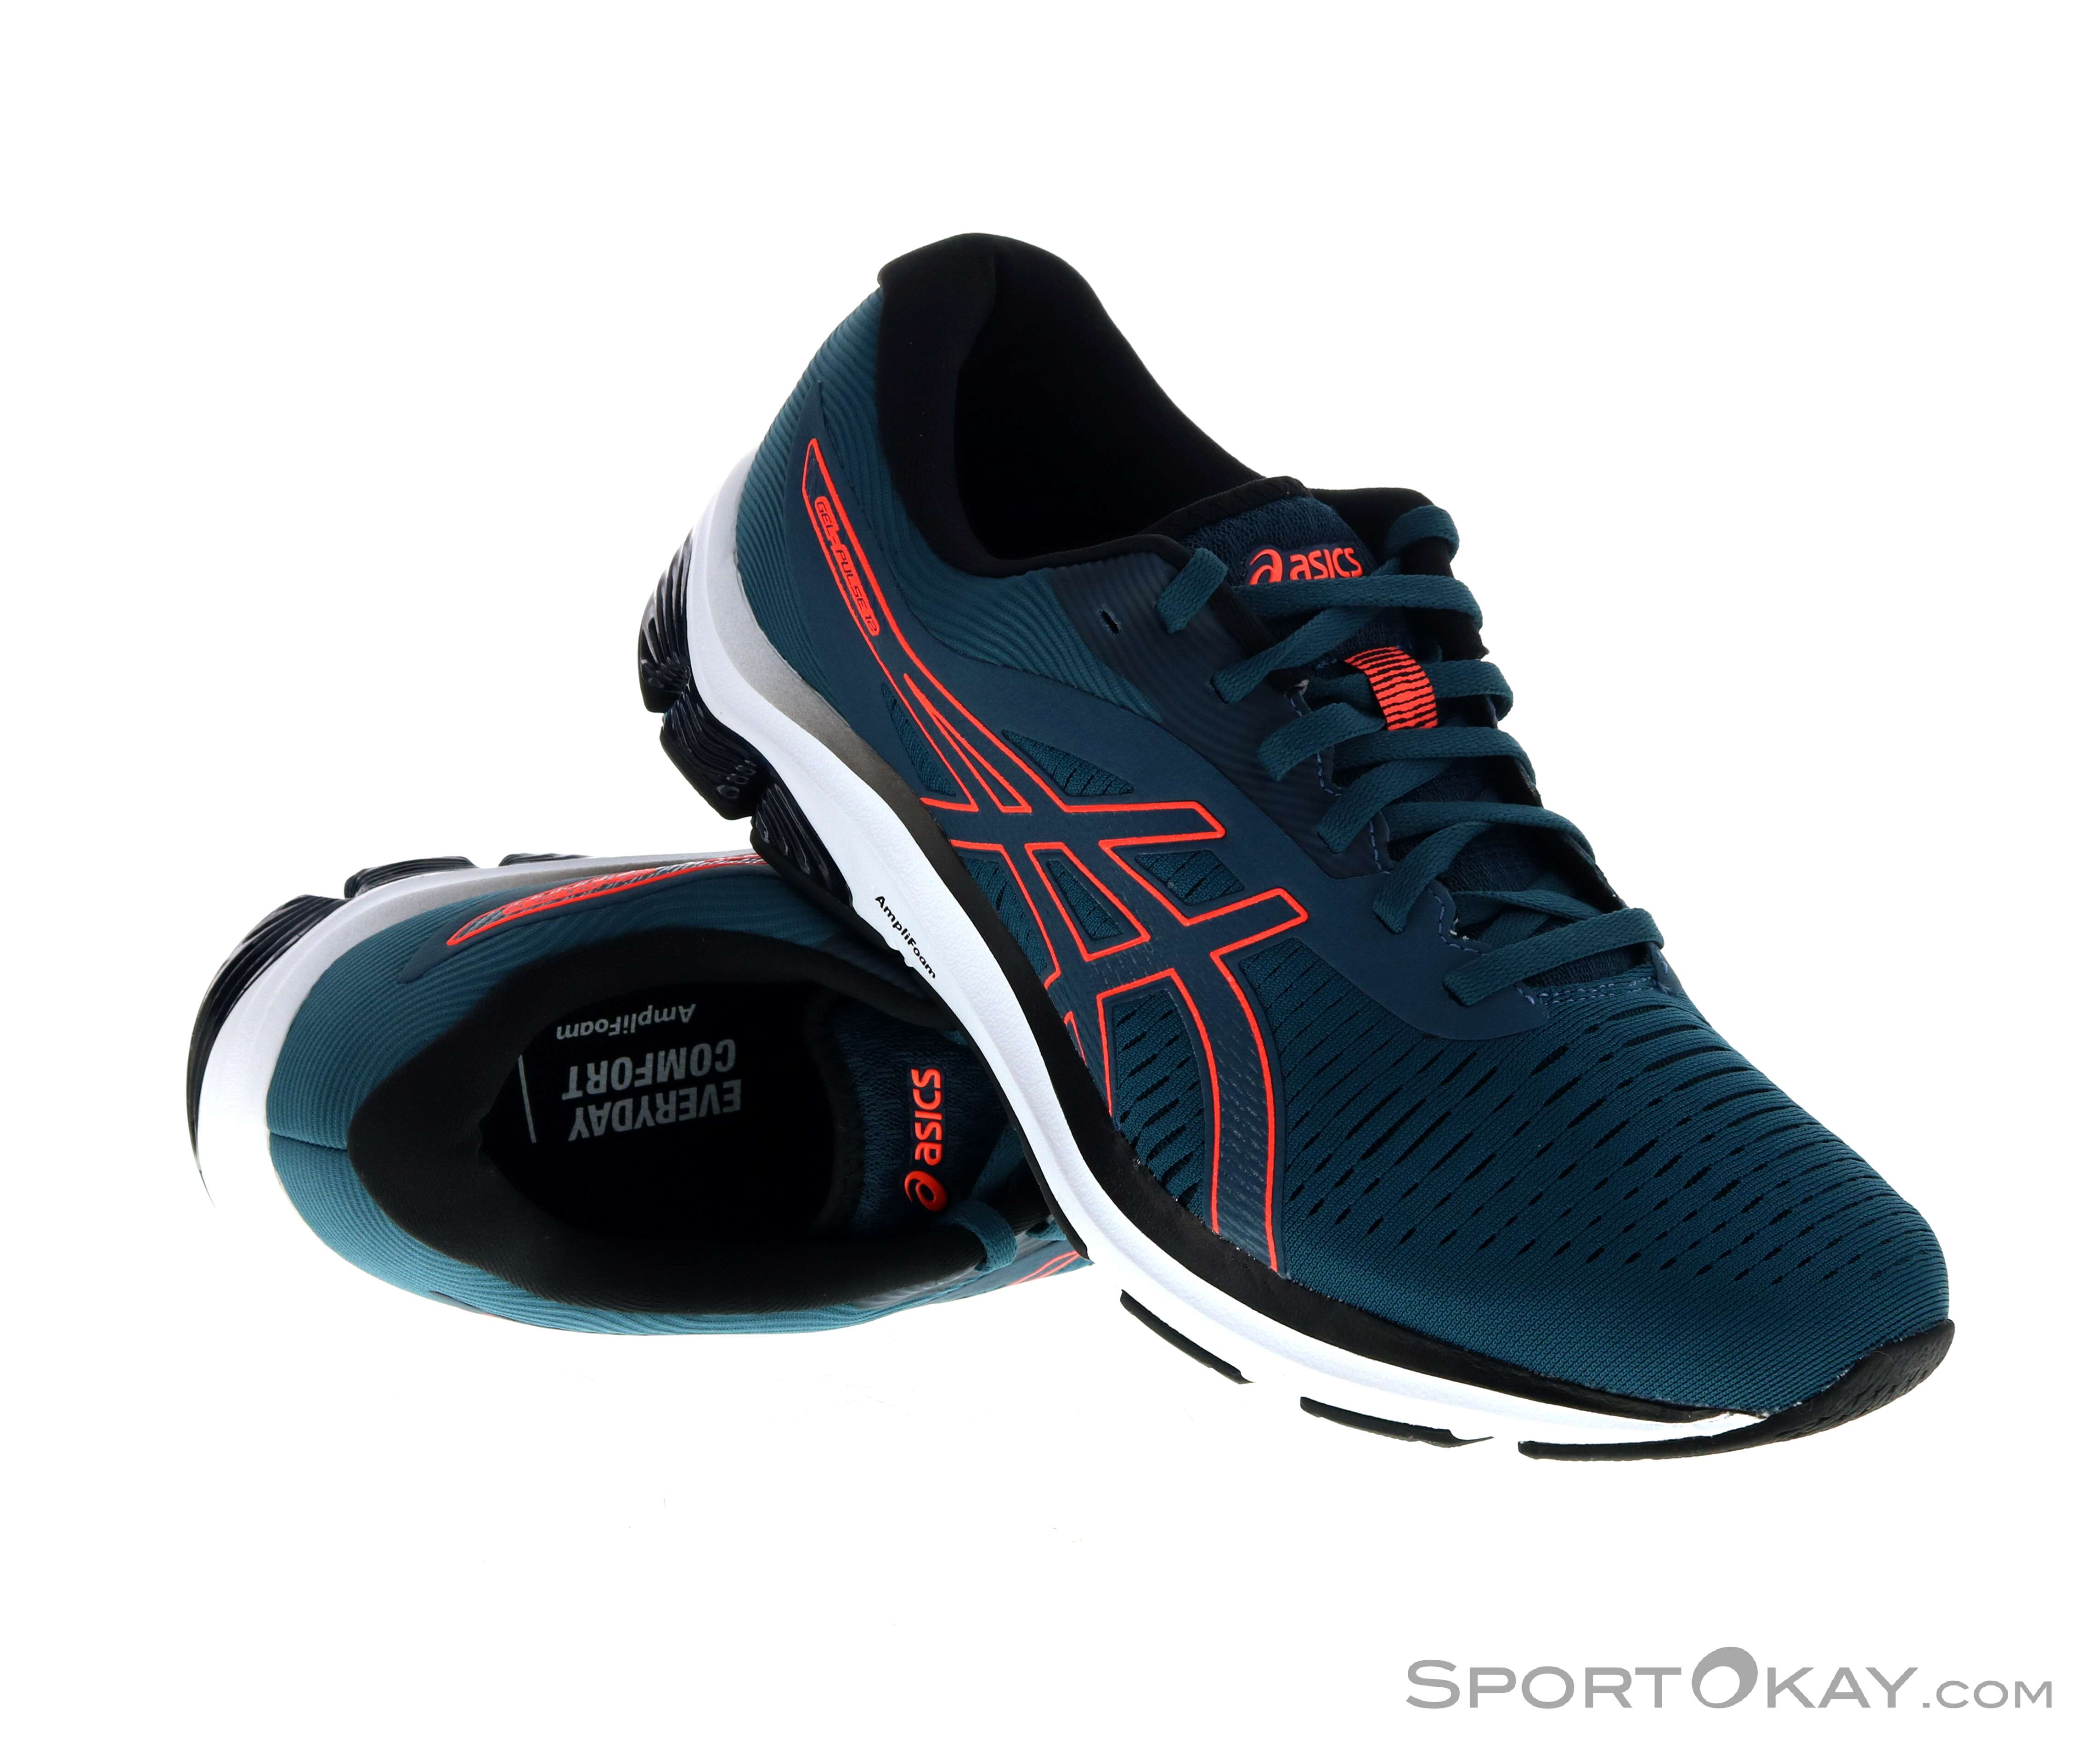 Asics Asics Gel-Pulse 12 Mens Running Shoes